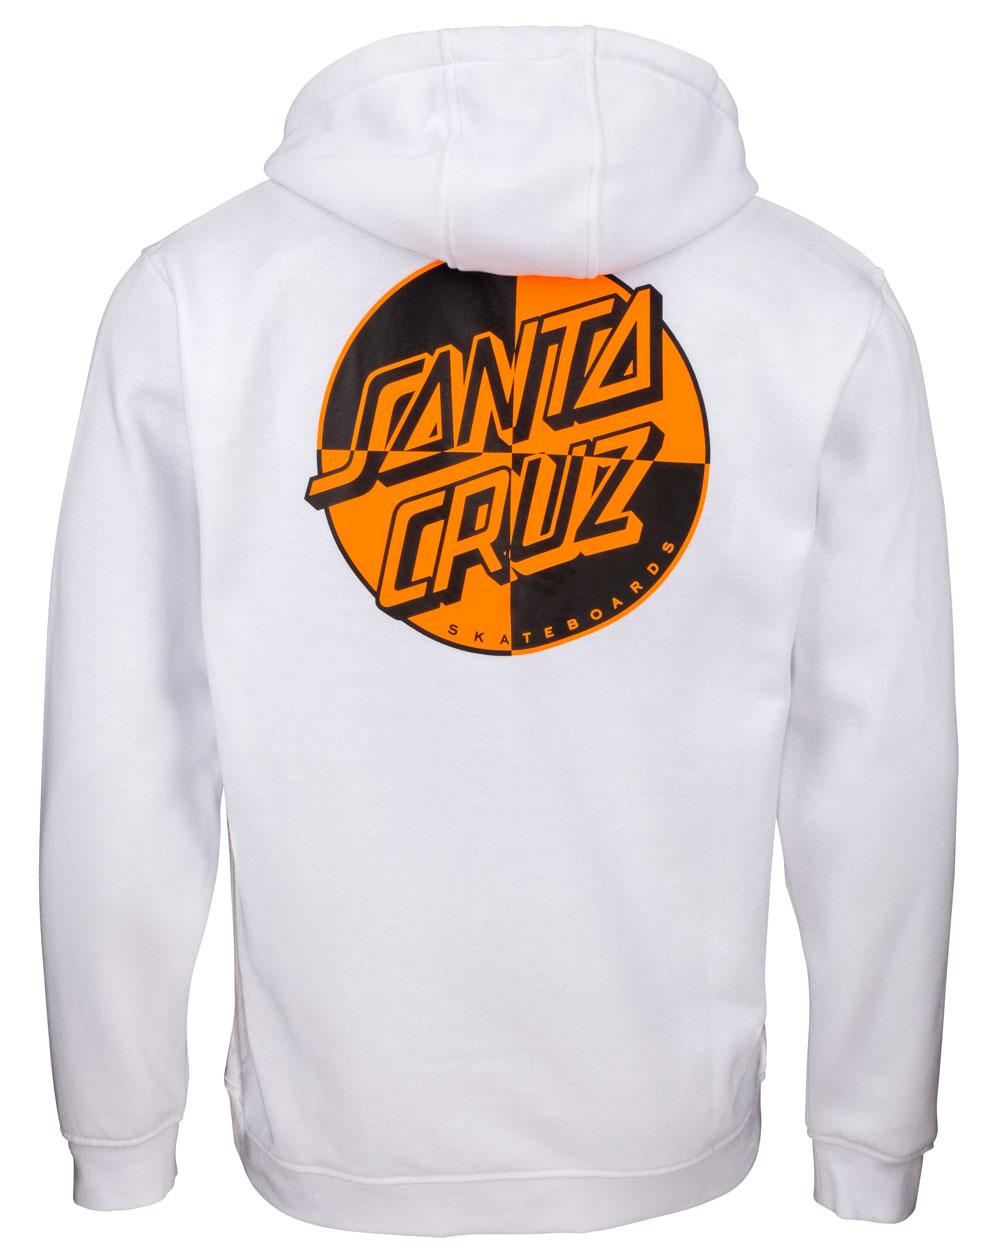 Santa Cruz Herren Kapuzenpullover Crash Dot White